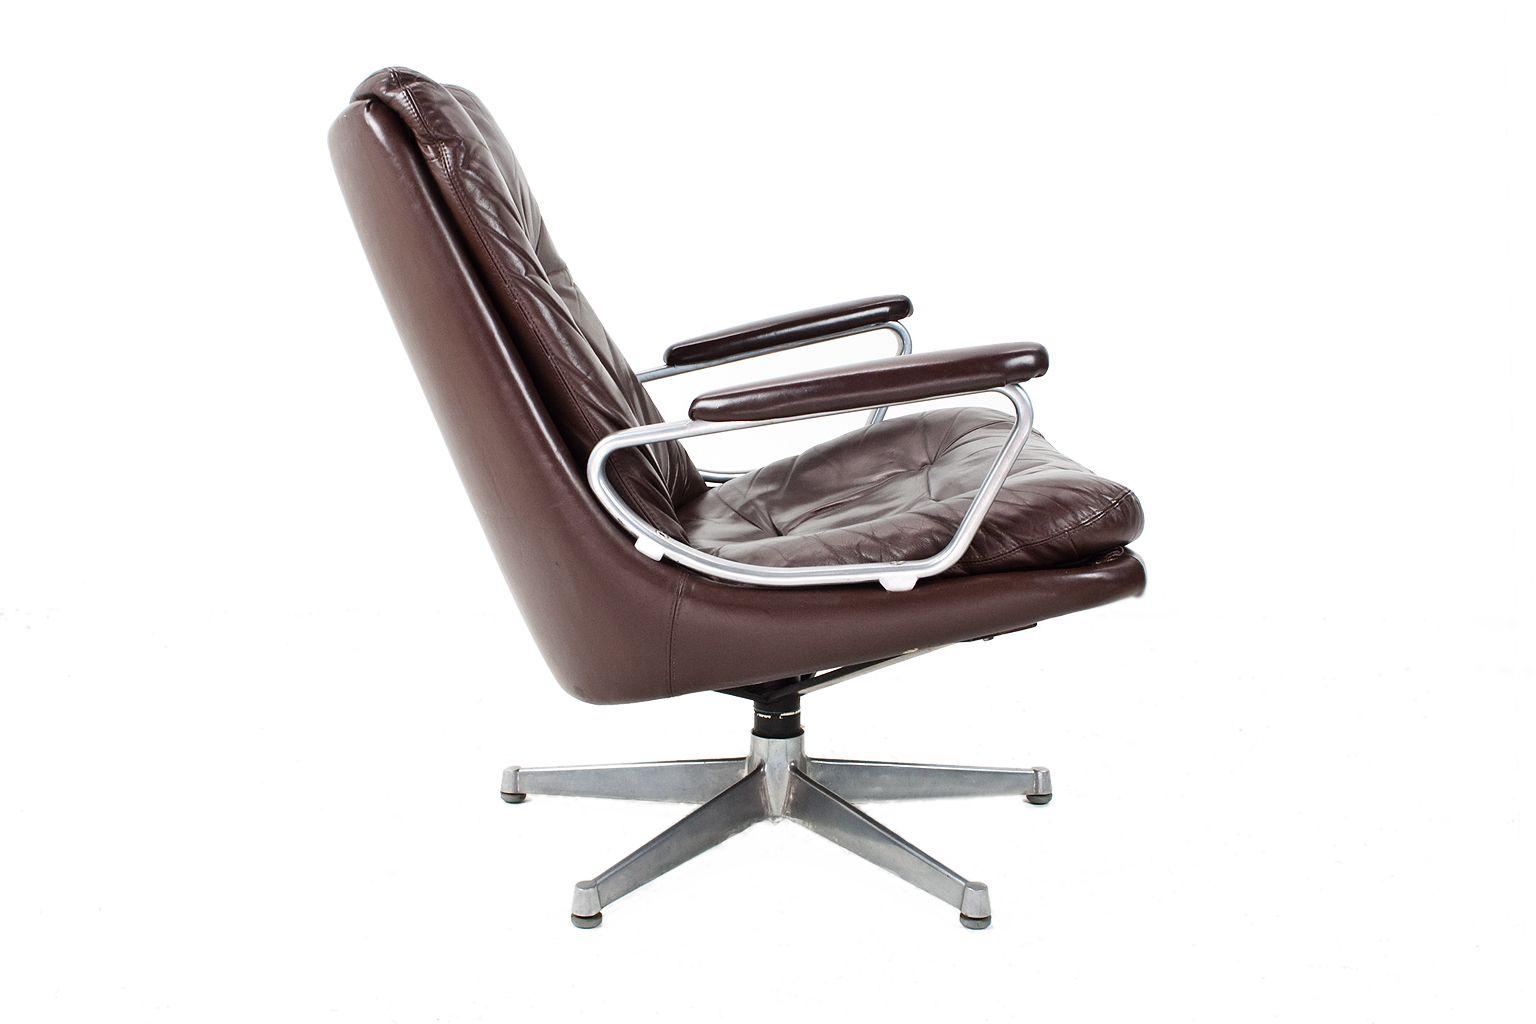 fauteuil pivotant gentilina vintage en cuir par andre. Black Bedroom Furniture Sets. Home Design Ideas